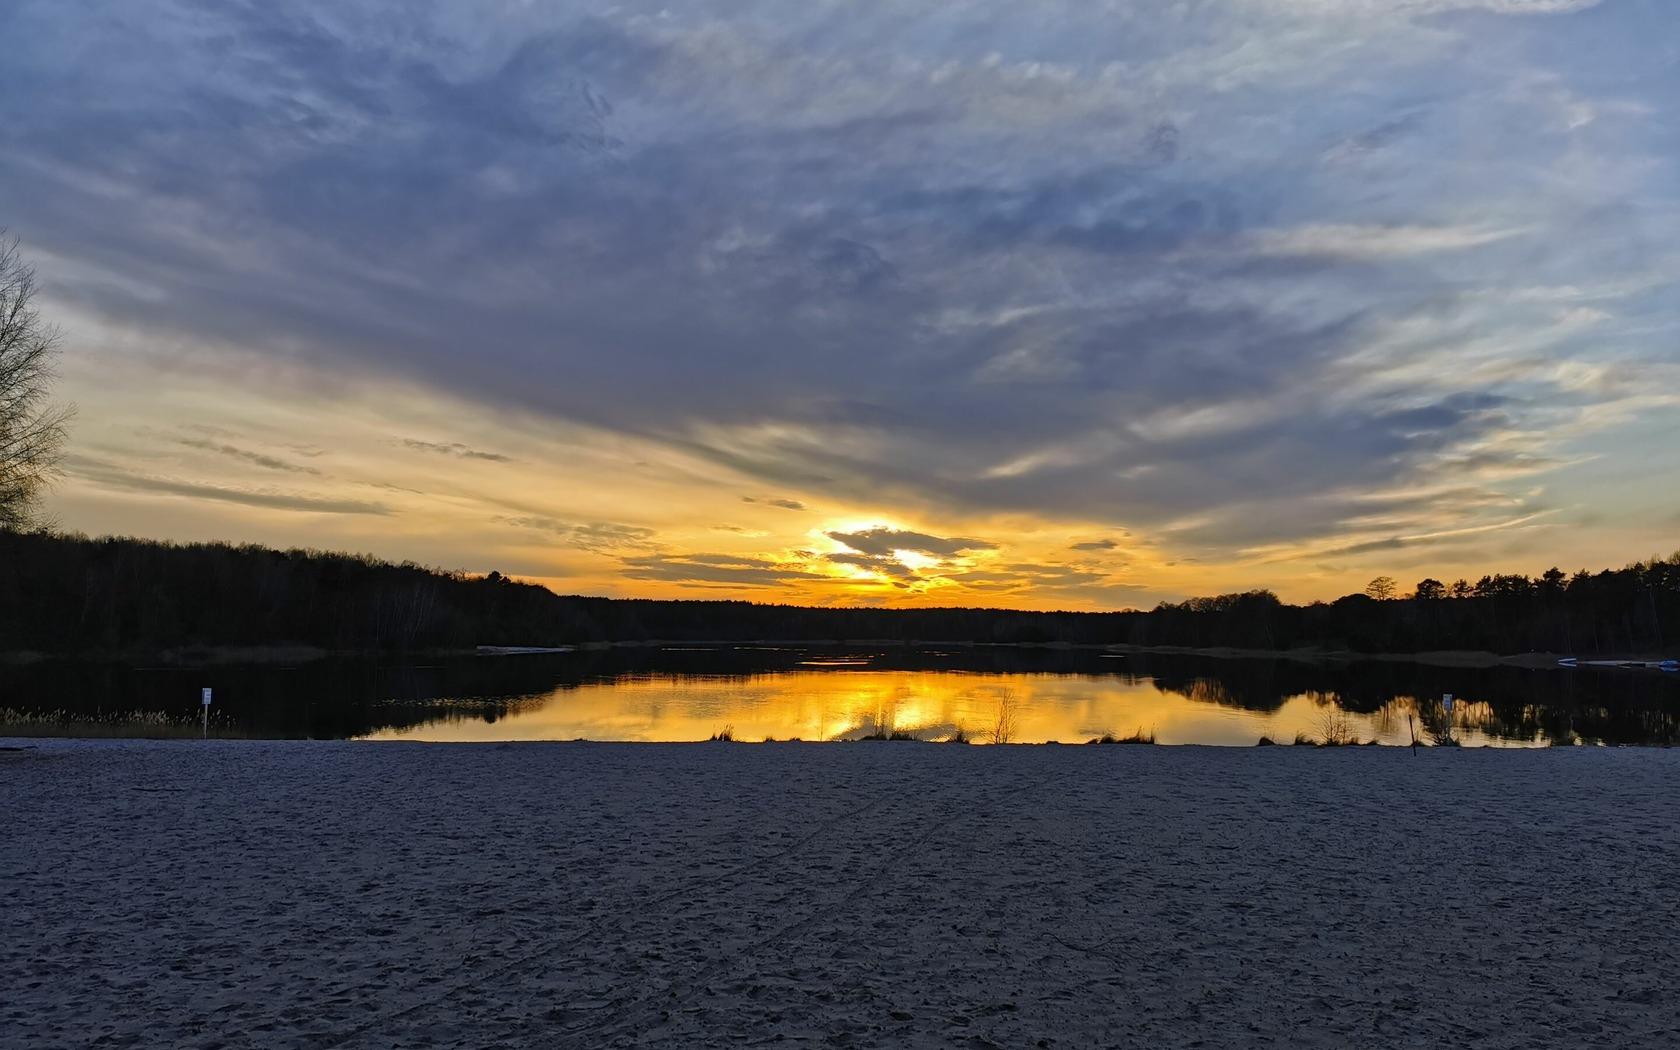 Sonnenuntergang am Großsee, Foto: R. Jahn, Lizenz: R. Jahn